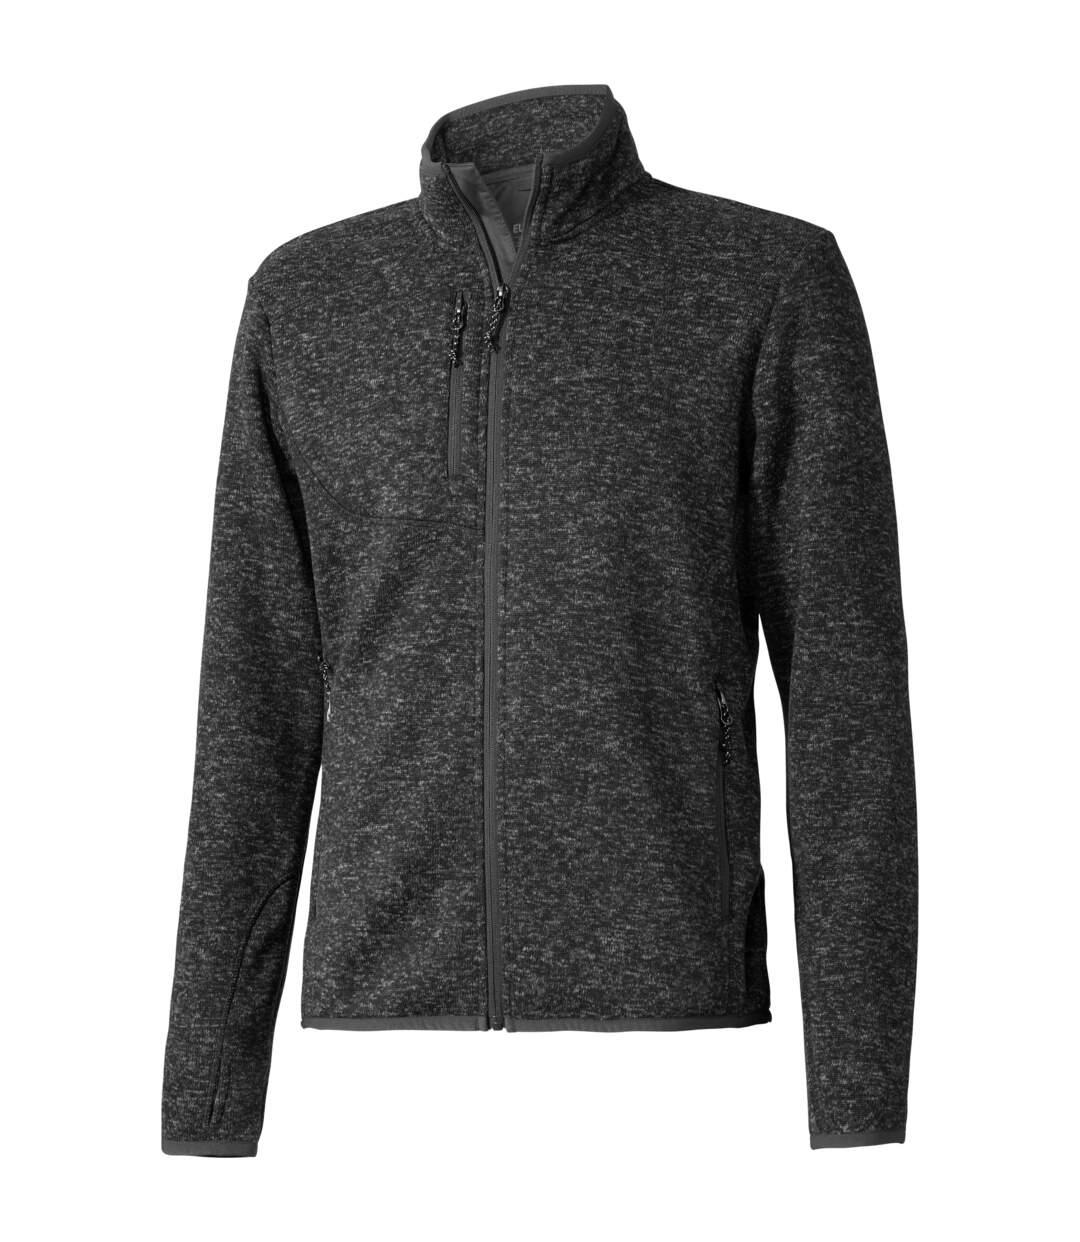 Elevate Mens Tremblant Knit Jacket (Heather Smoke) - UTPF1954